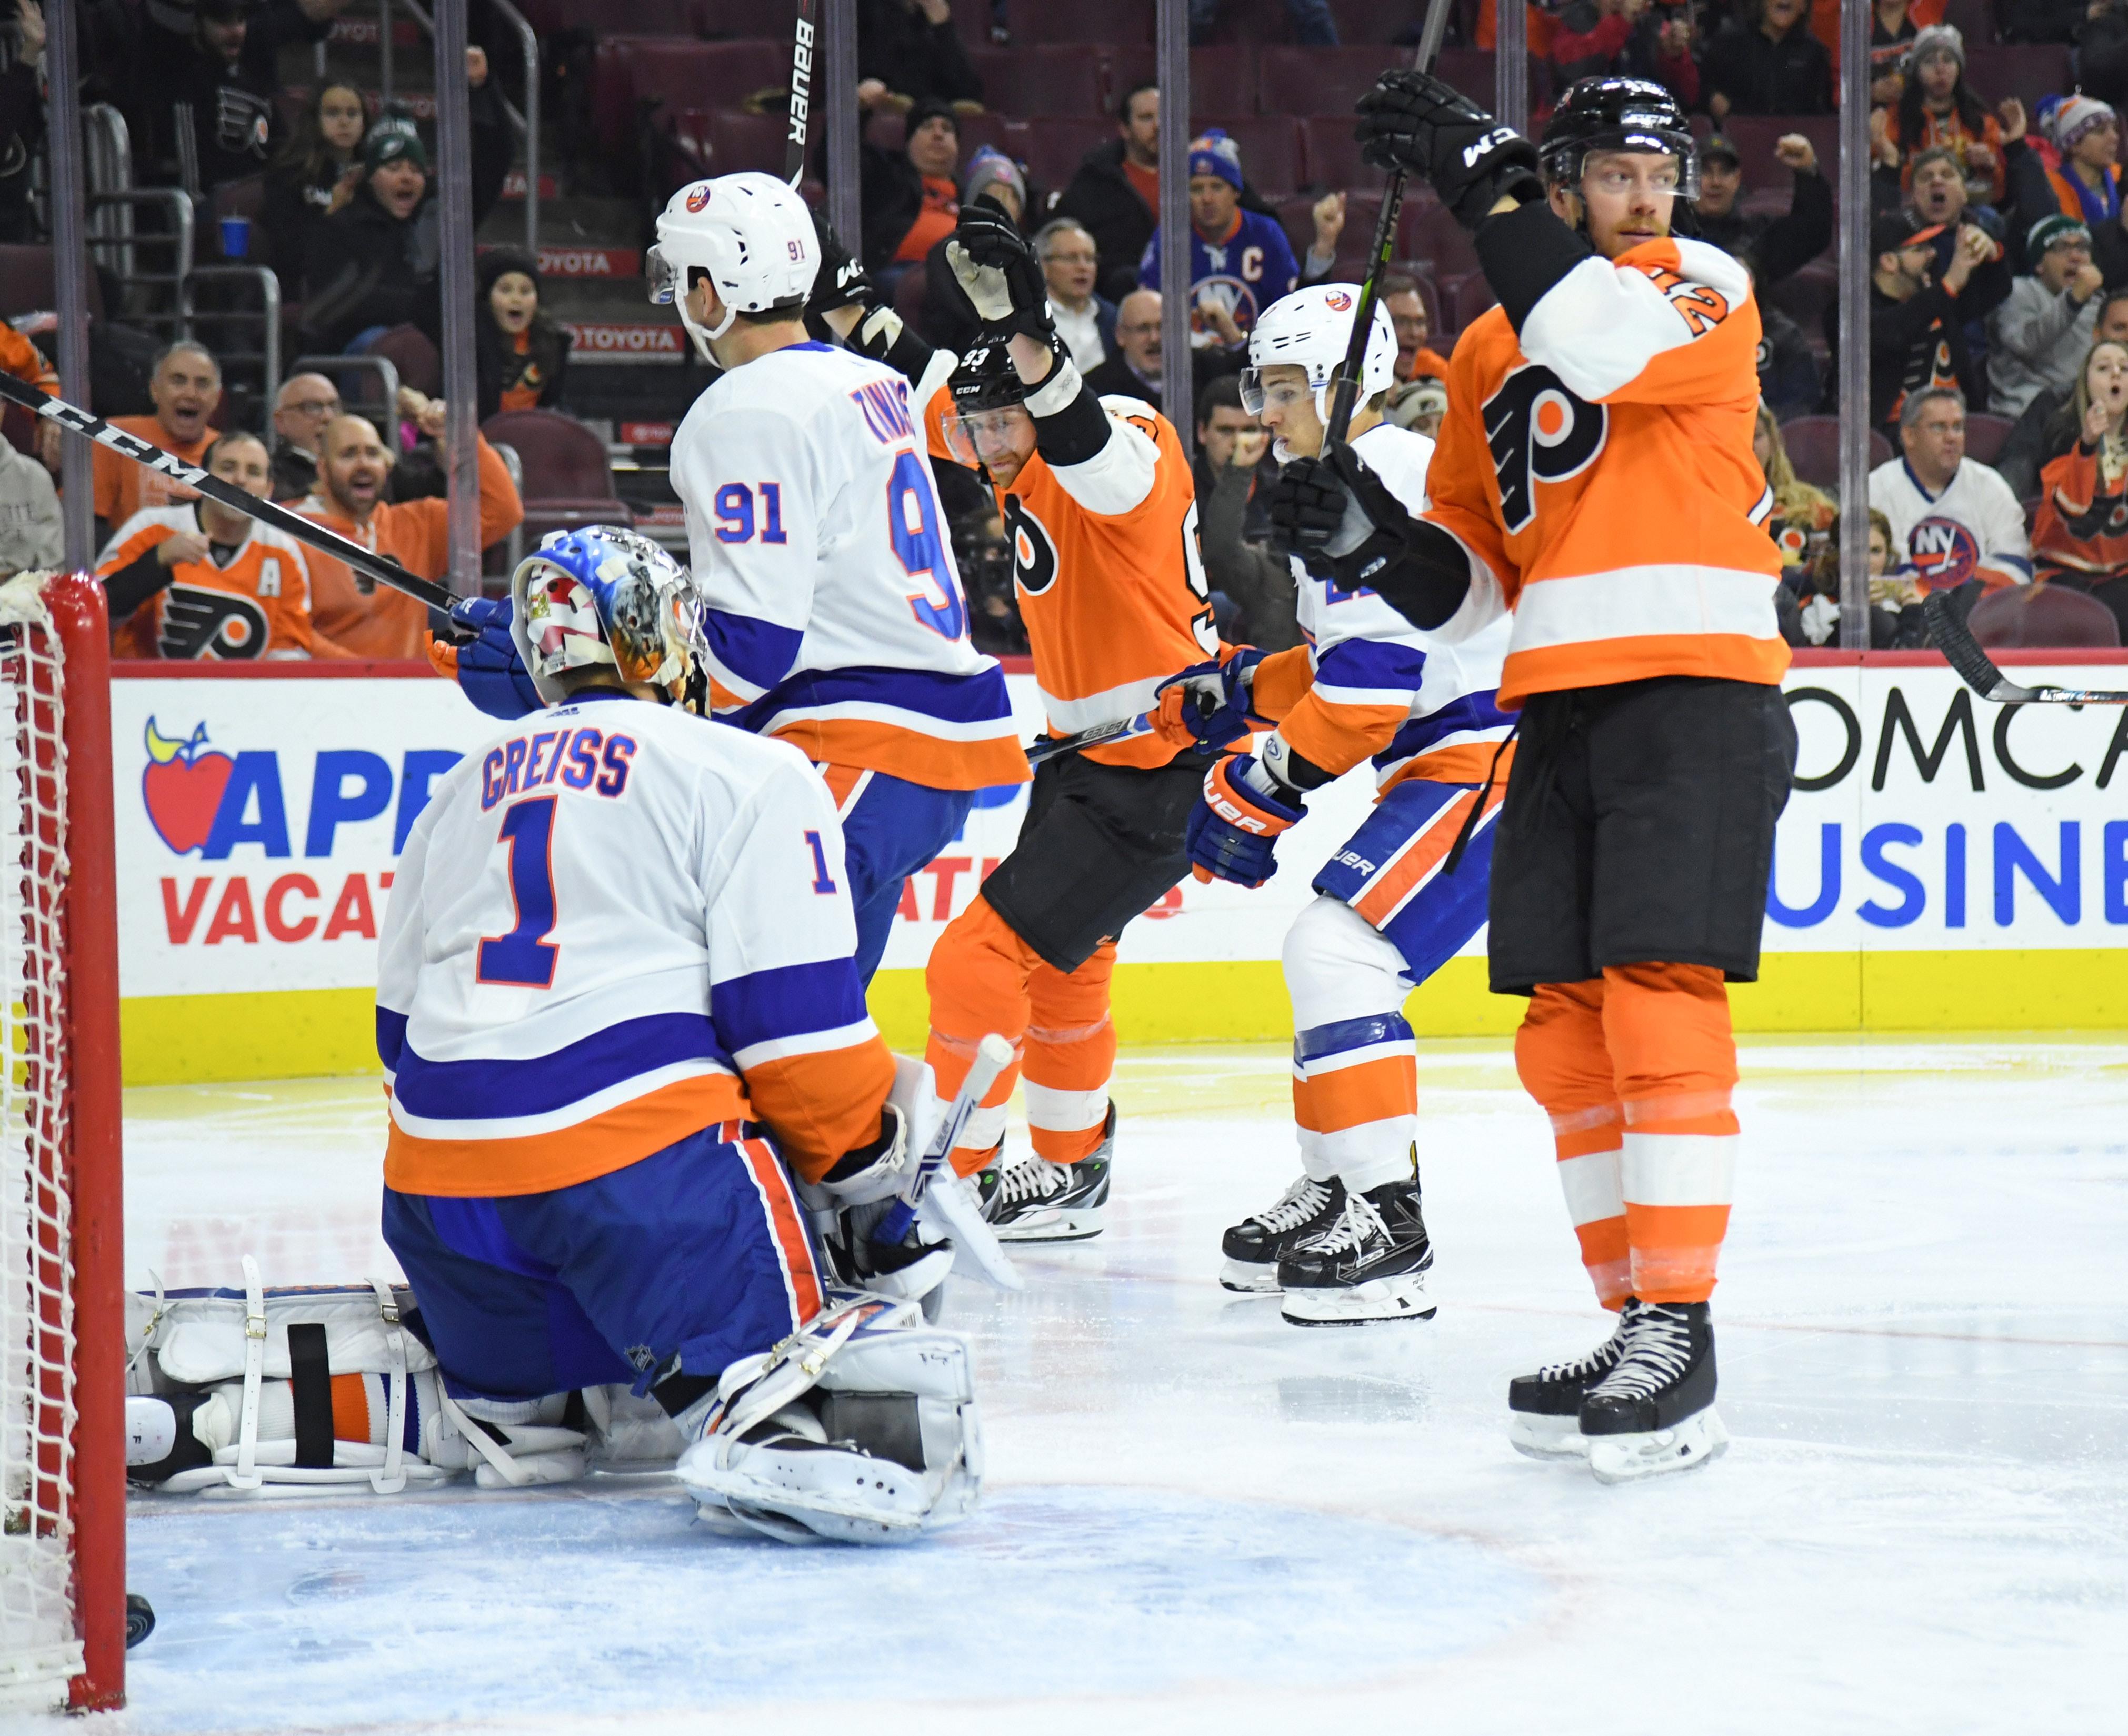 Isles Insights: Islanders comeback falls short in loss to Flyers